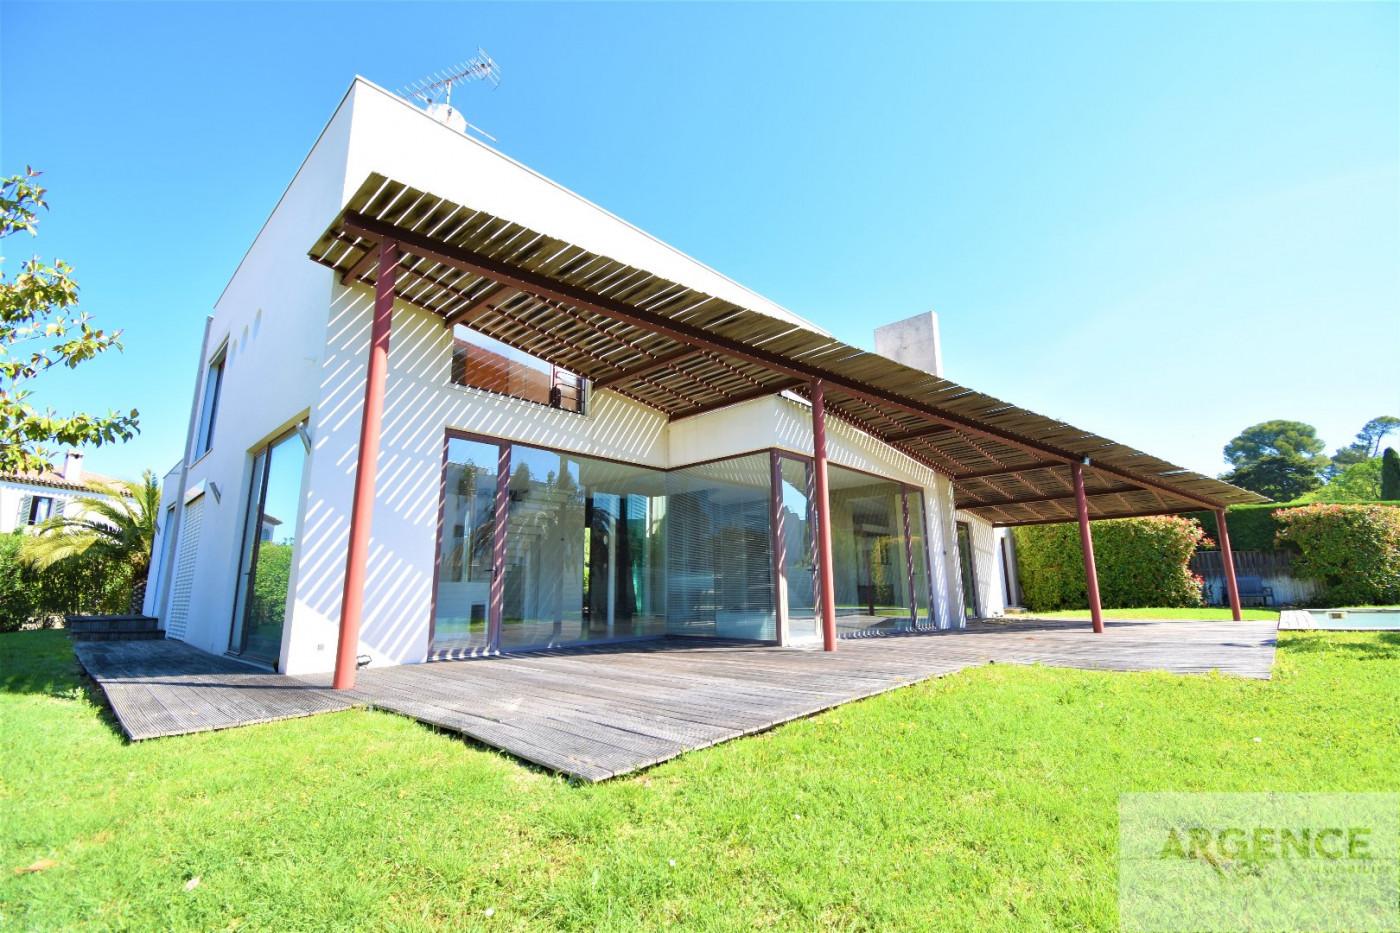 A vendre  Montpellier   Réf 345335756 - Argence immobilier